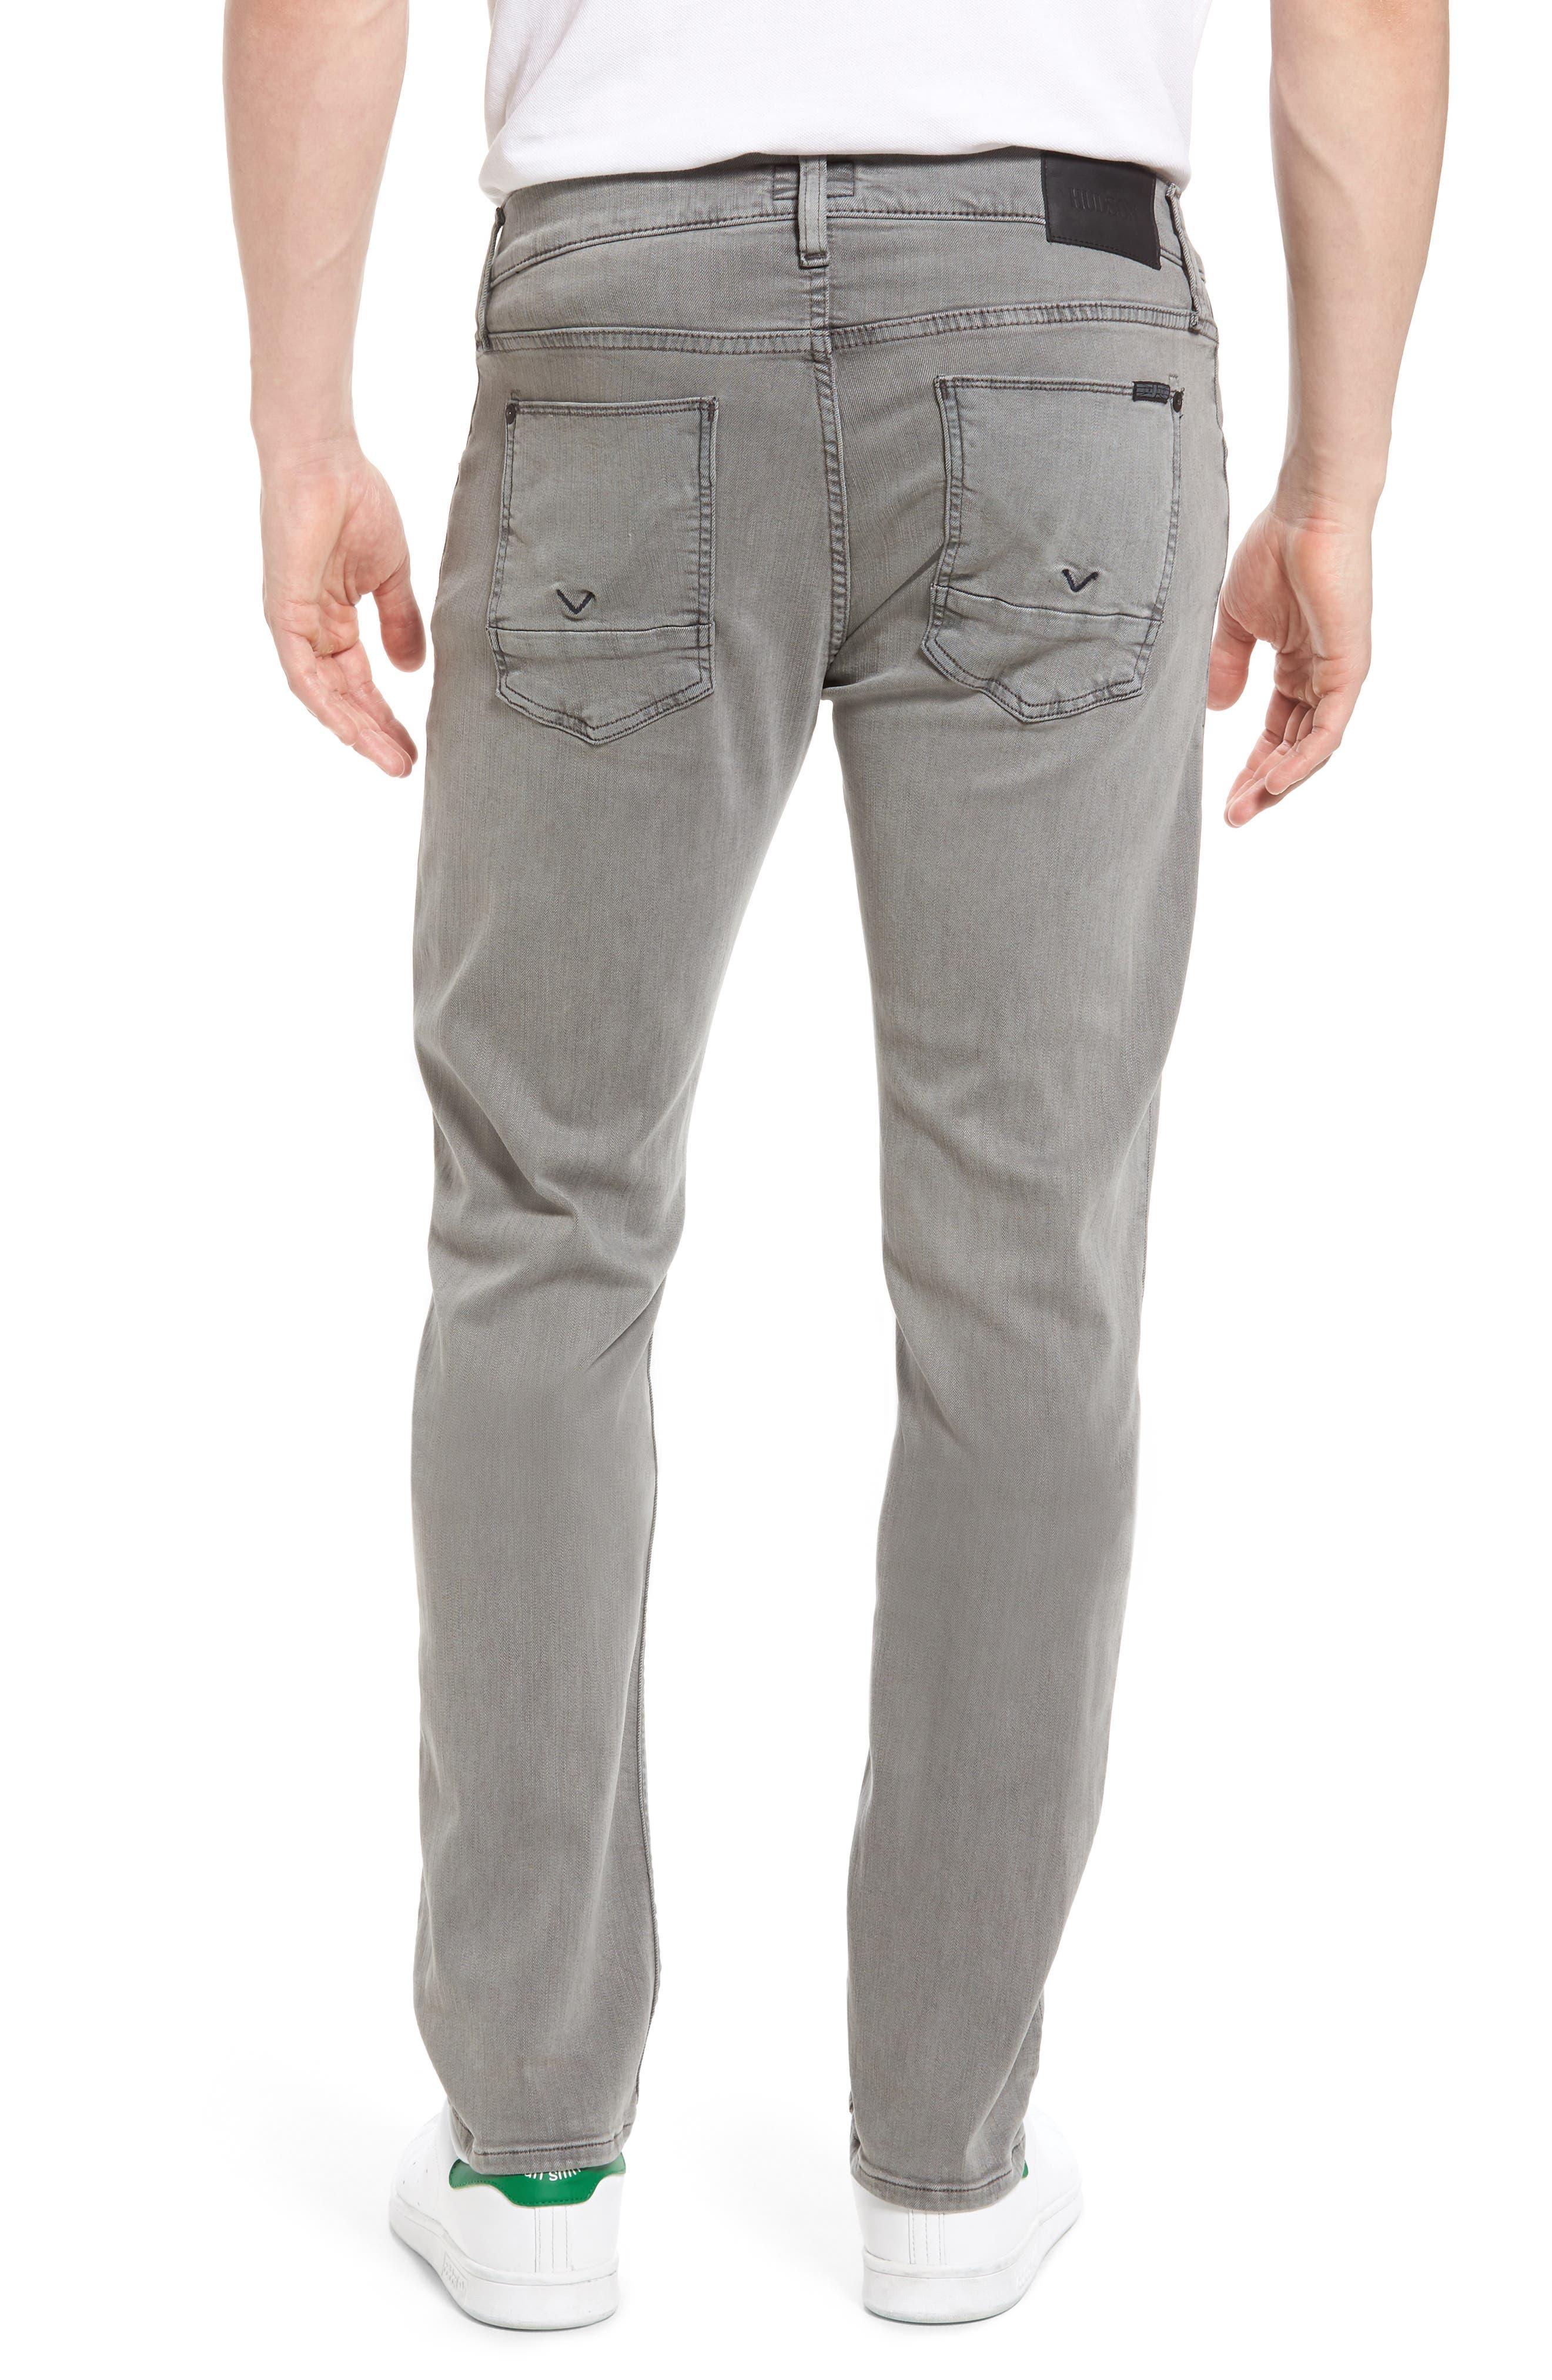 Blake Slim Fit Jeans,                             Alternate thumbnail 2, color,                             023